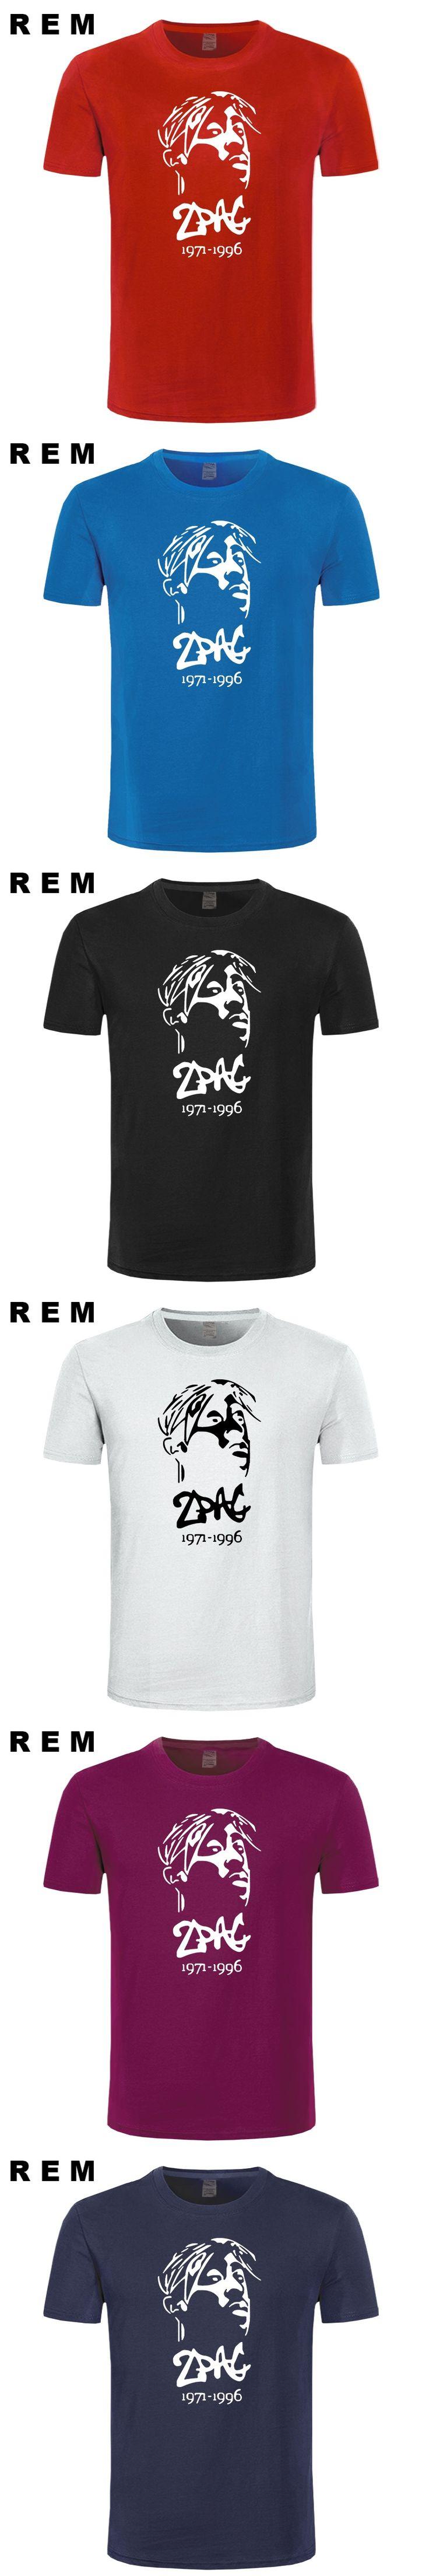 Thug Life Tupac 2PAC Hip-hop Rap Rock Mens Men T Shirt T-shirt Fashion 2016 New Short Sleeve O Neck Cotton Tshirt Tee